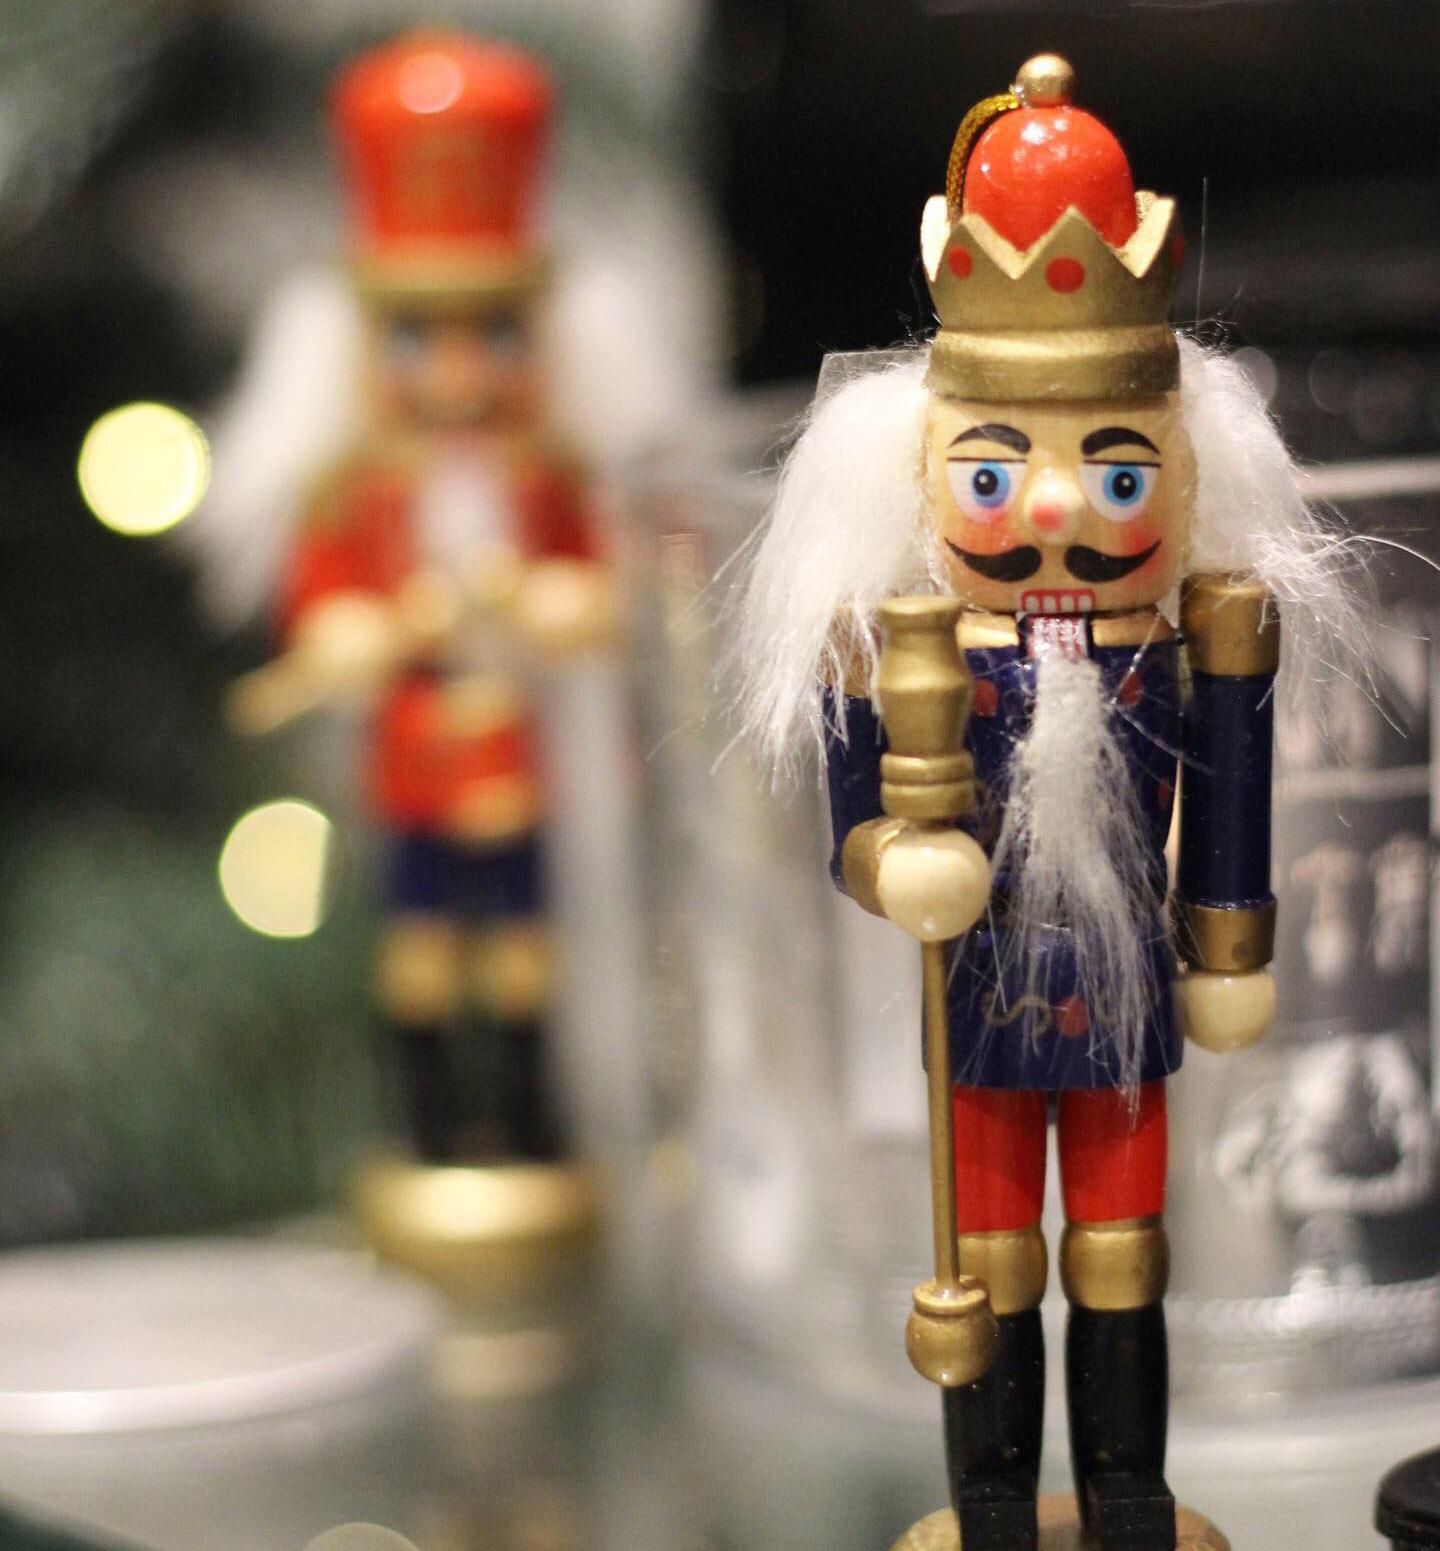 Christmas Nutcracker Decorations